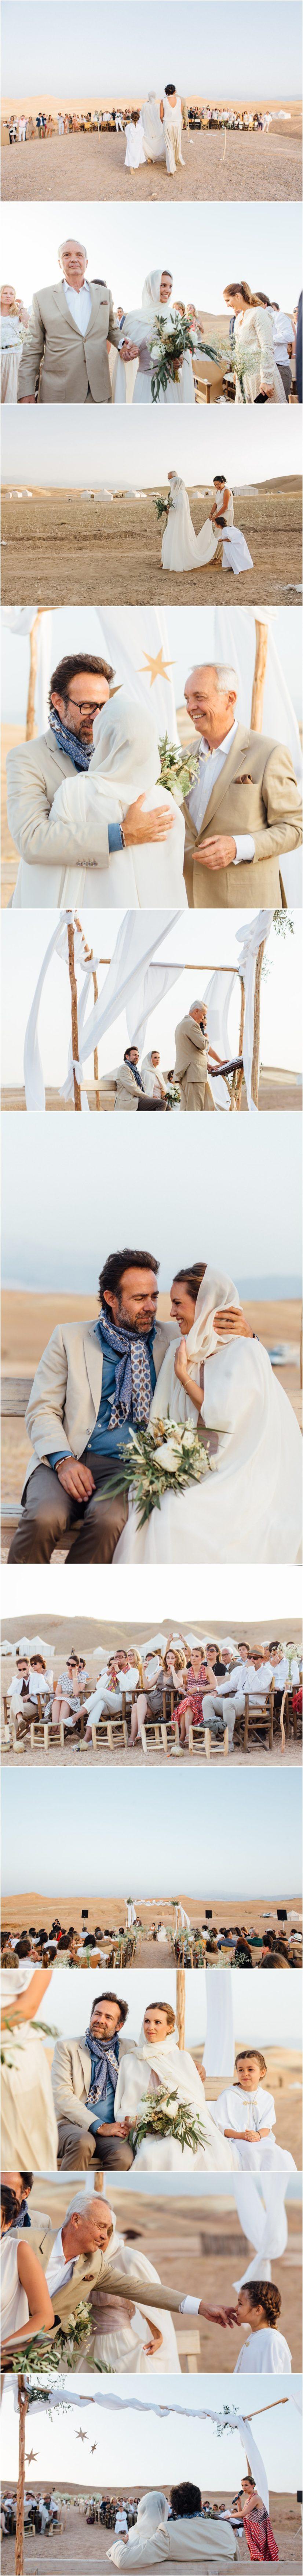 photographe mariage Lyon 10